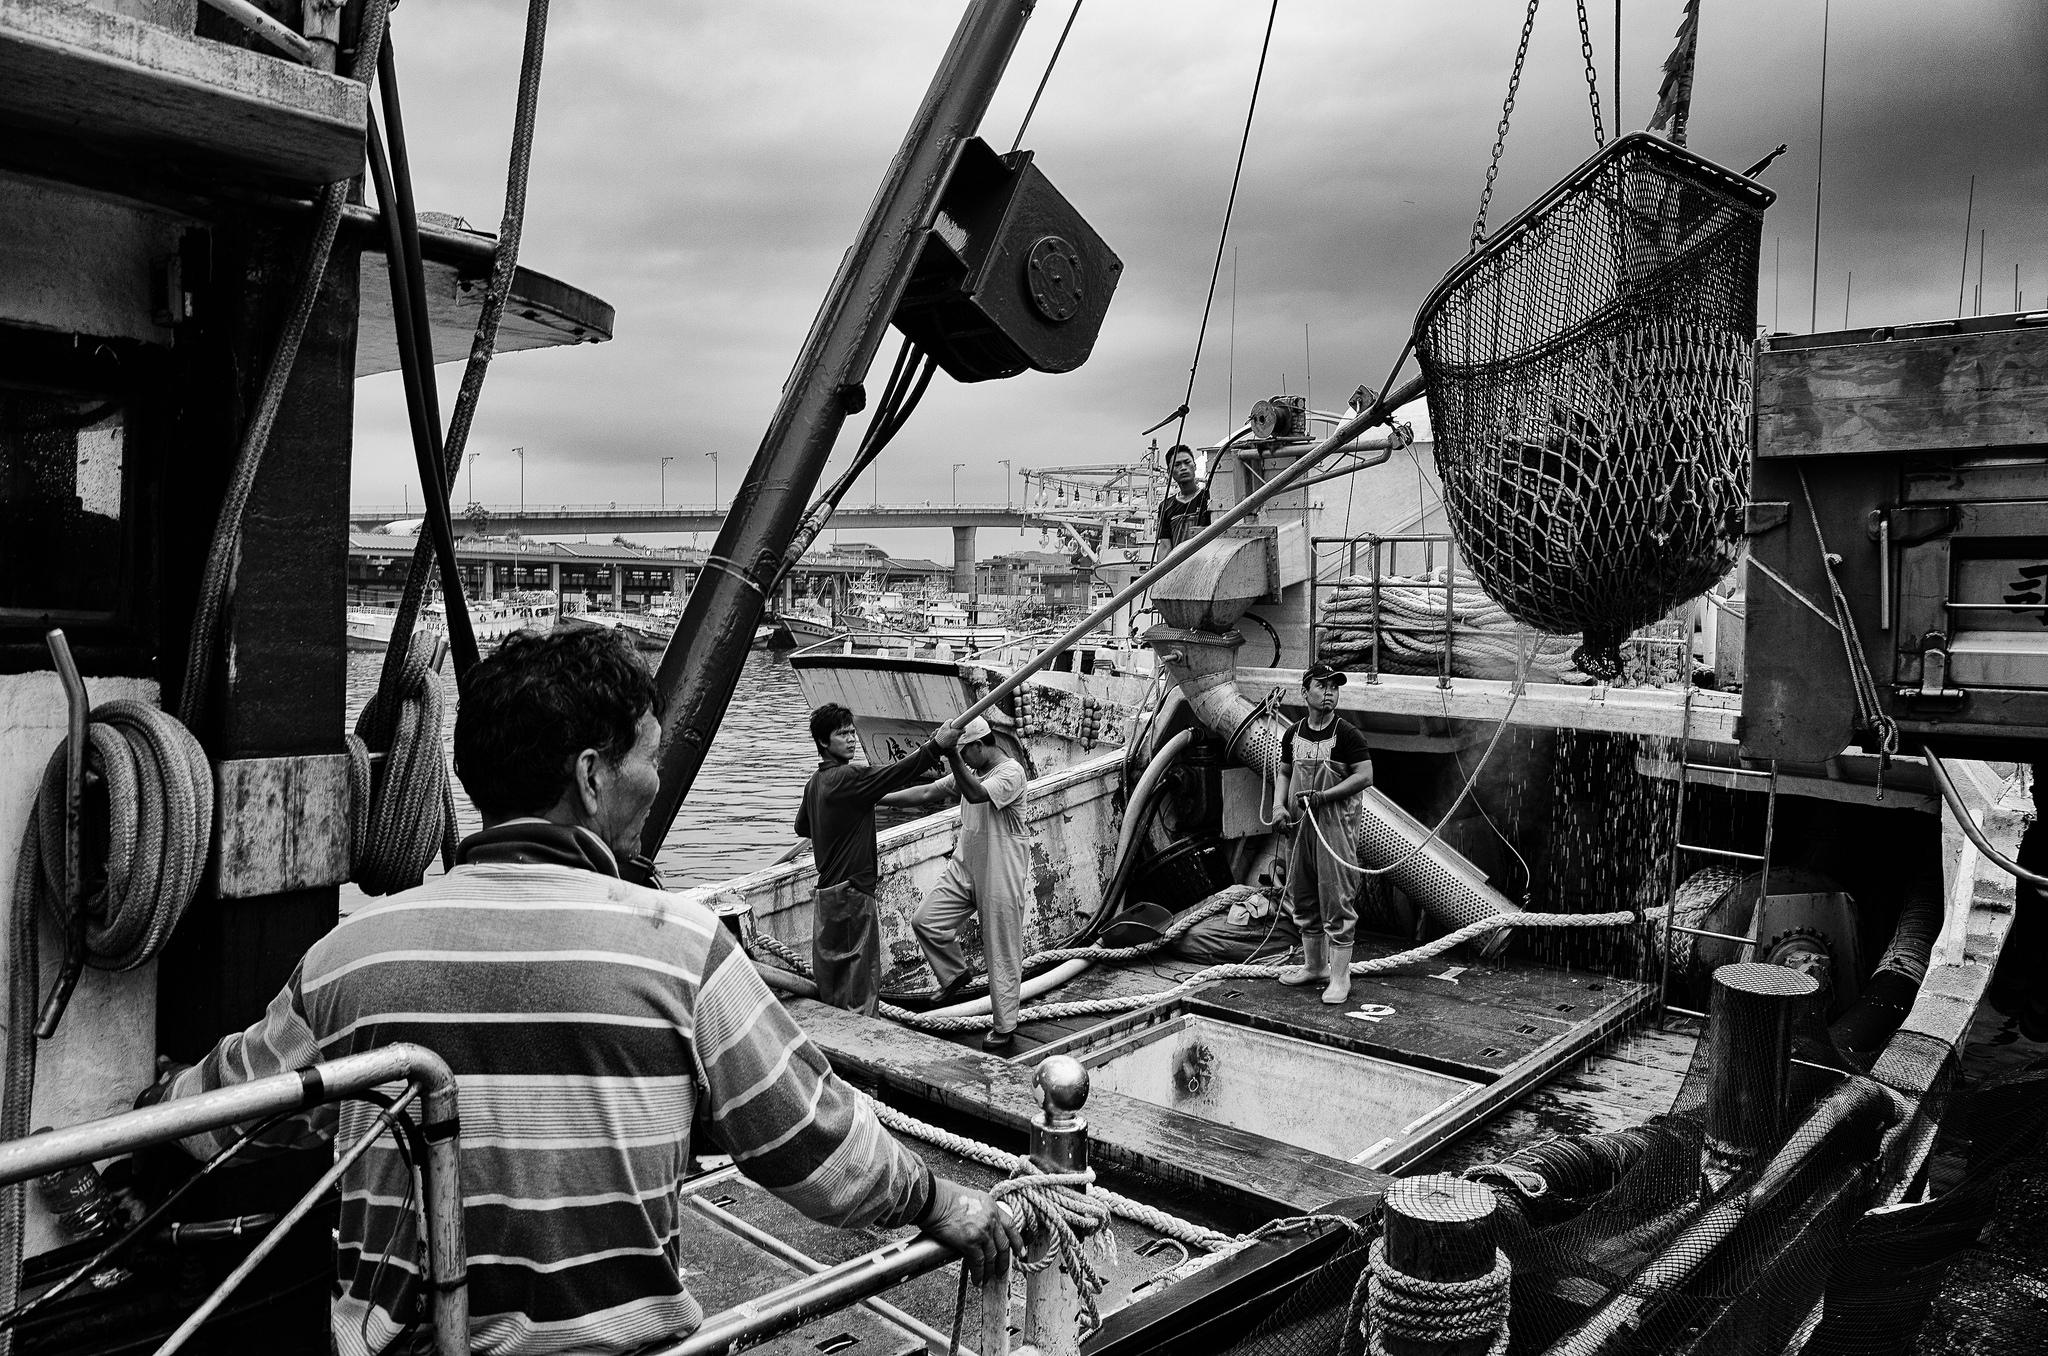 Barco pesquero. Foto por Jorge Gonzalez